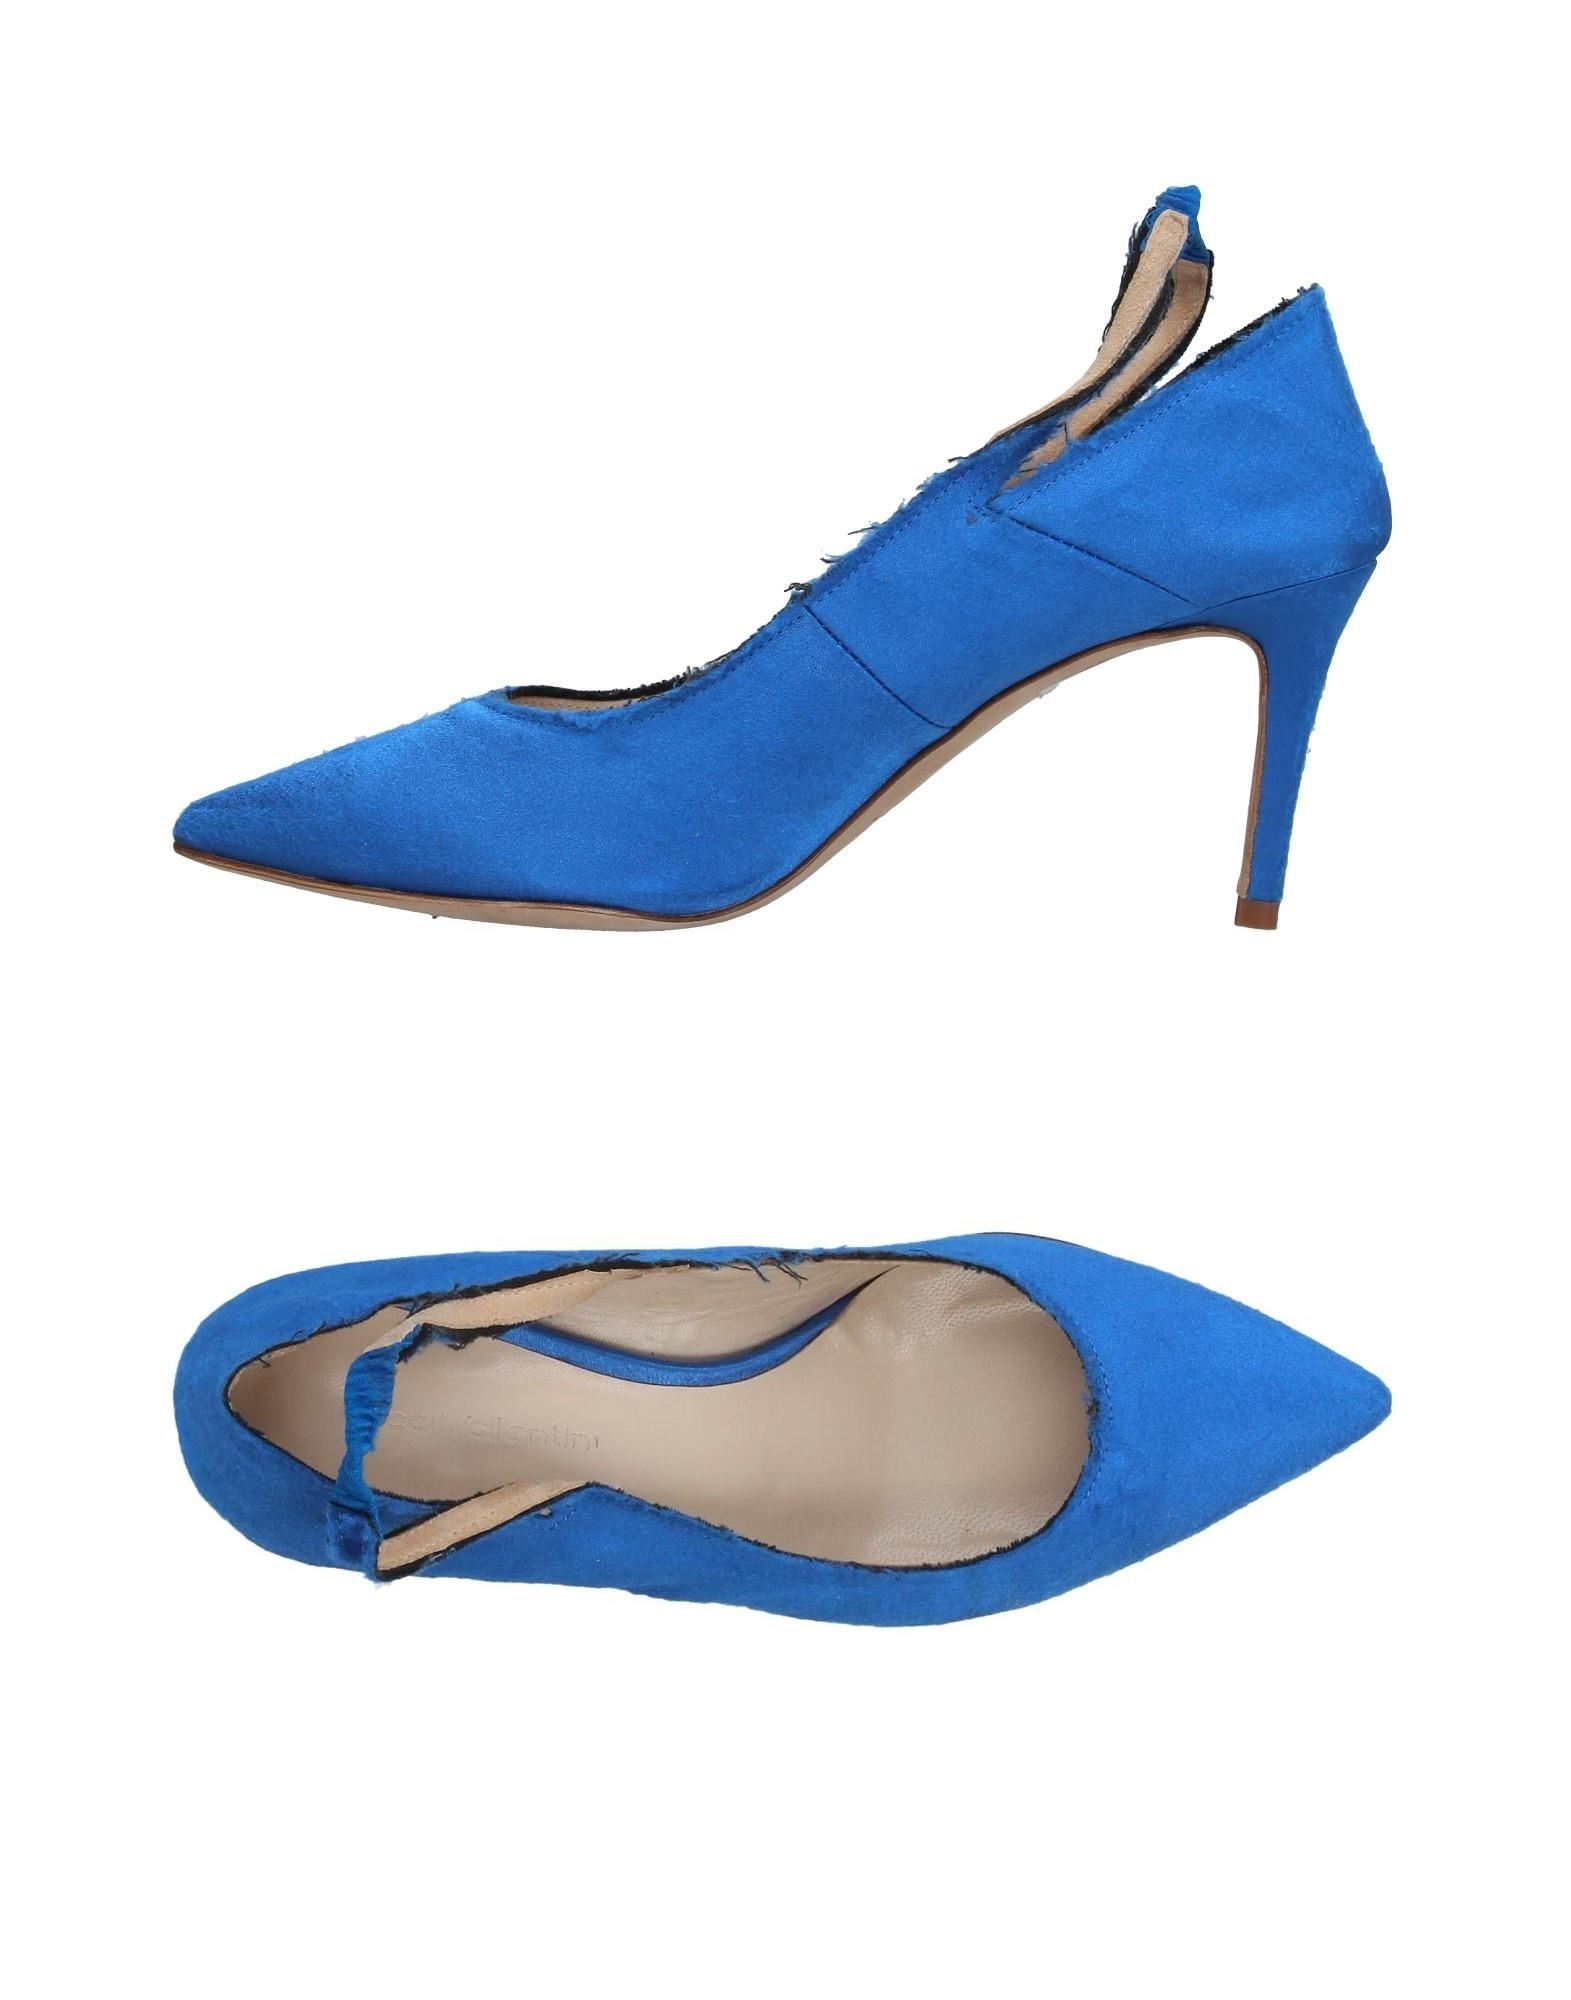 Luca Valentini Pumps Gute Damen  11376984FL Gute Pumps Qualität beliebte Schuhe 5c2f12